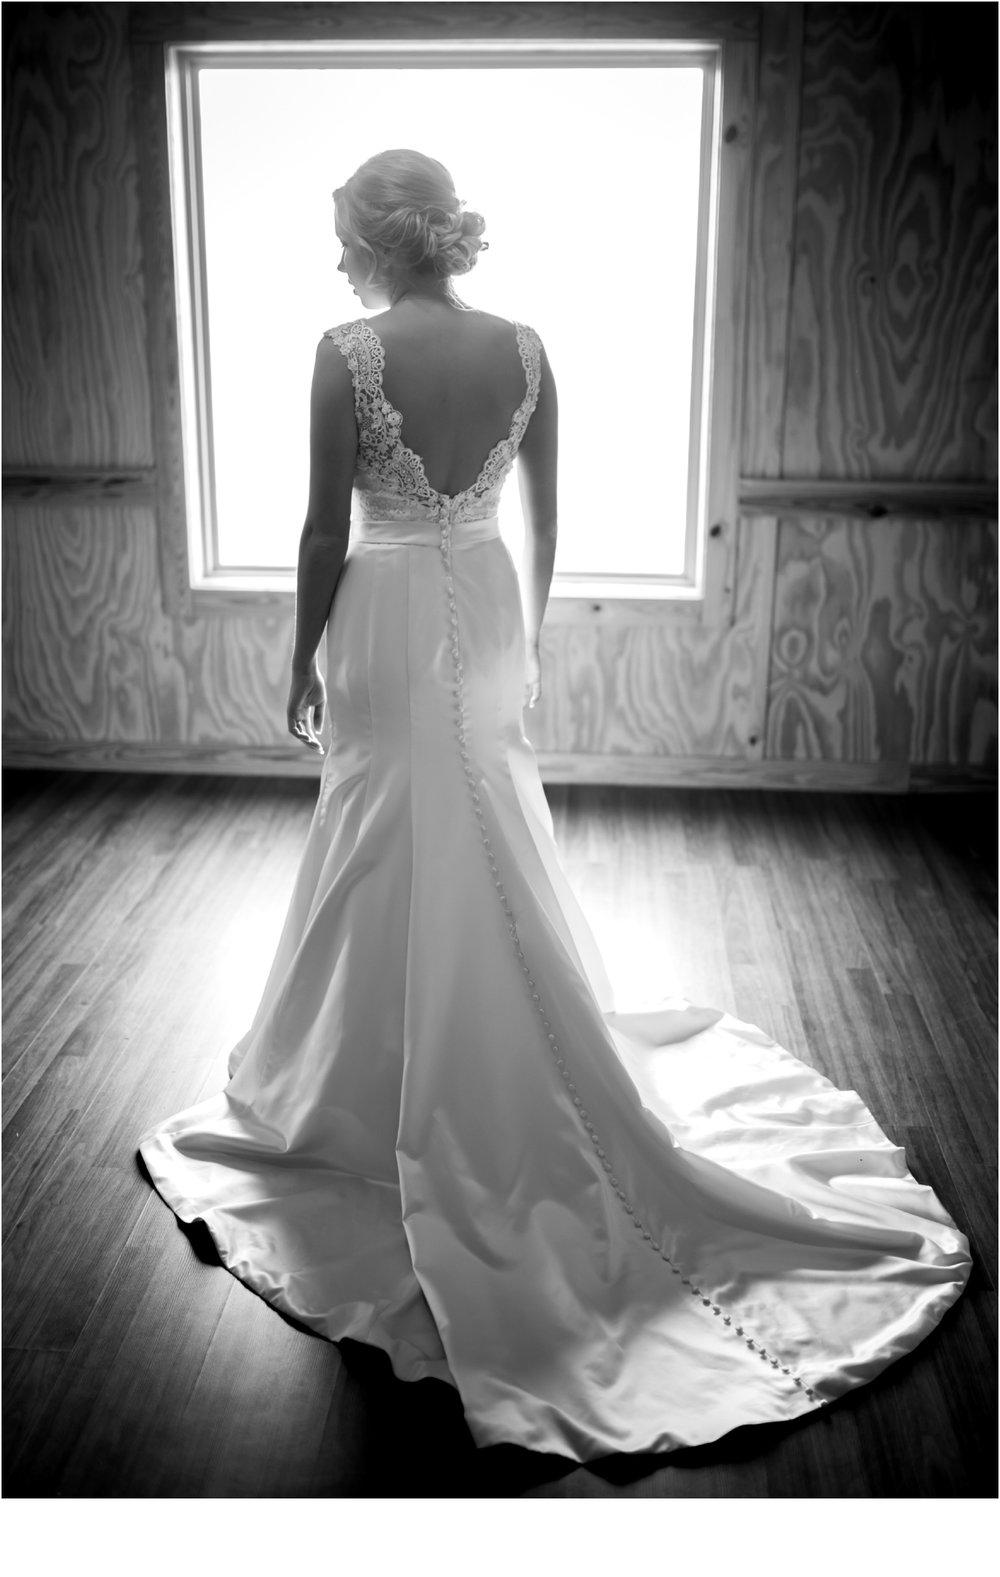 Rainey_Gregg_Photography_St._Simons_Island_Georgia_California_Wedding_Portrait_Photography_0475.jpg